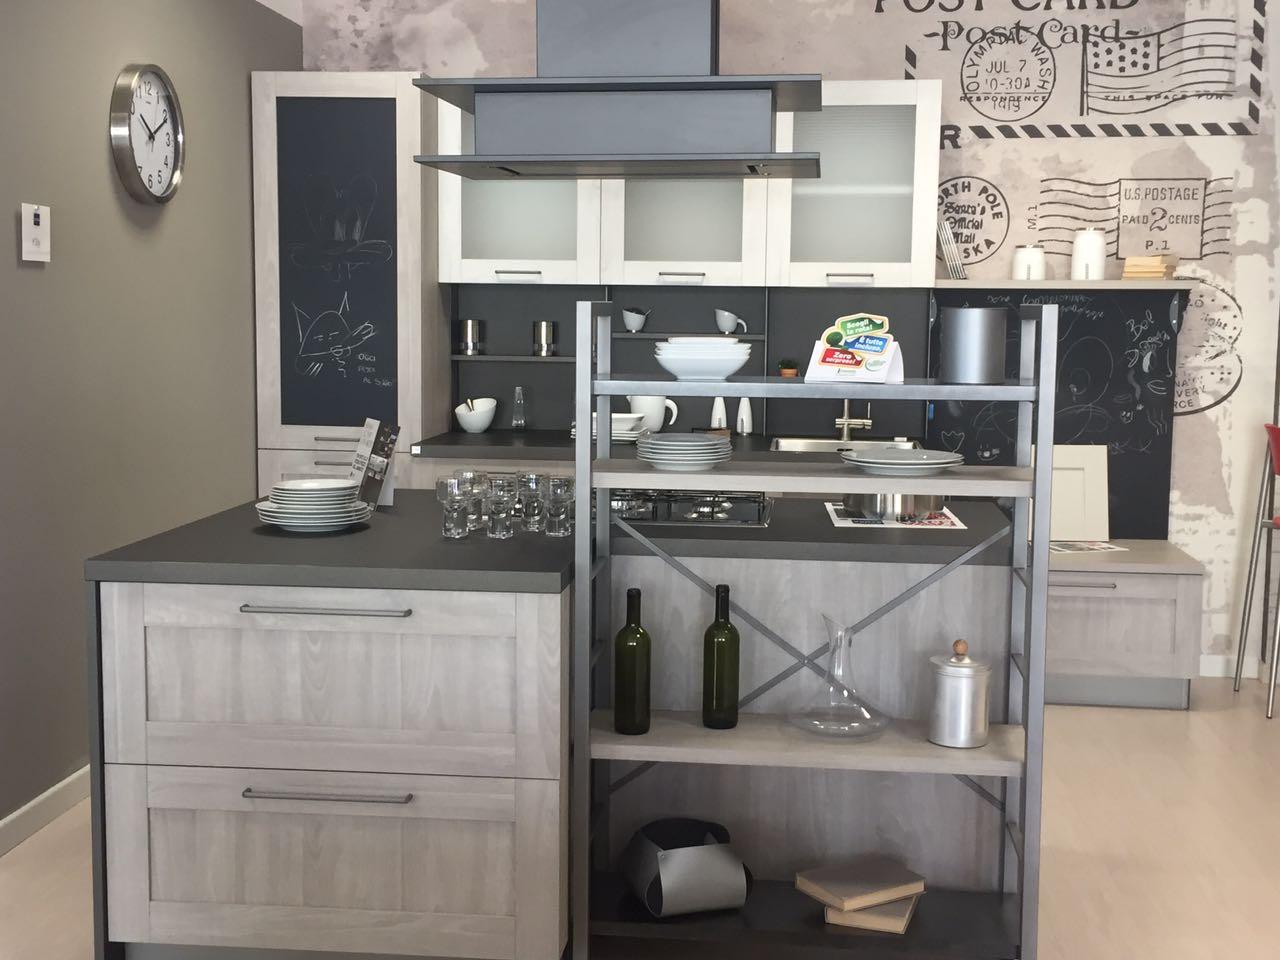 Cucina stosa mod city guerino fava mobili - Cucina city stosa ...